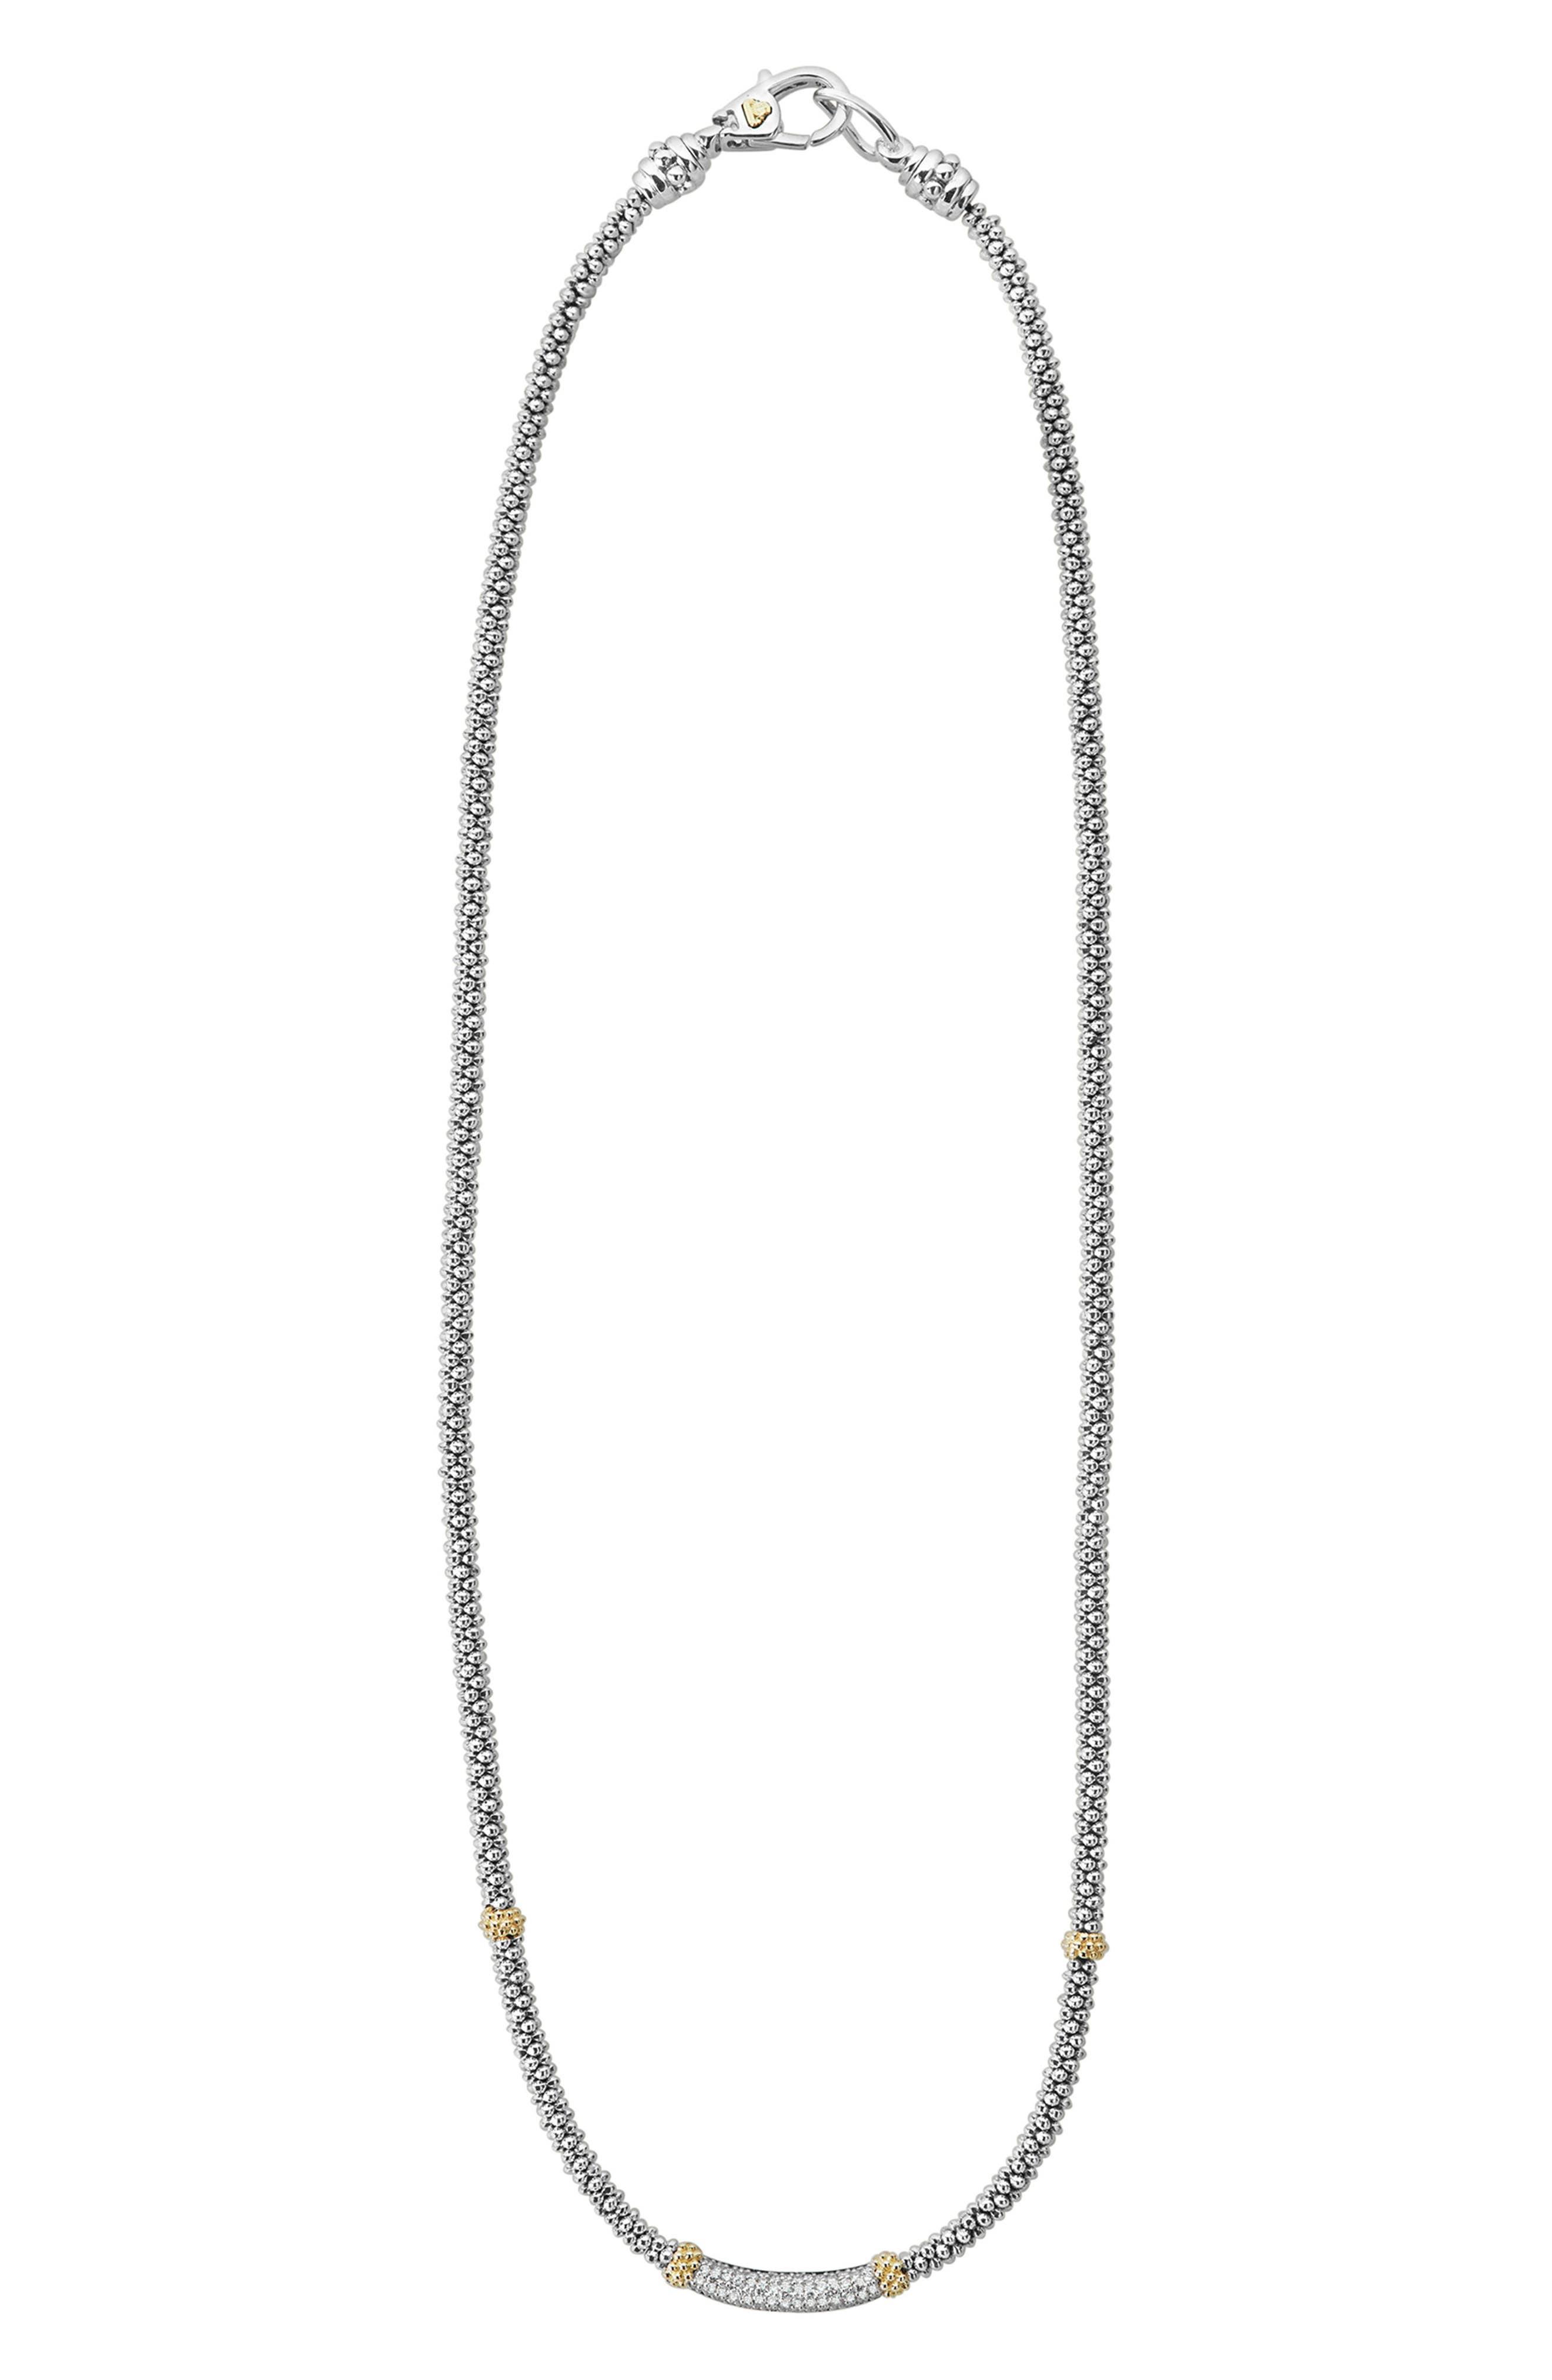 Lux Diamond Rope Necklace,                             Alternate thumbnail 2, color,                             SILVER/ DIAMOND